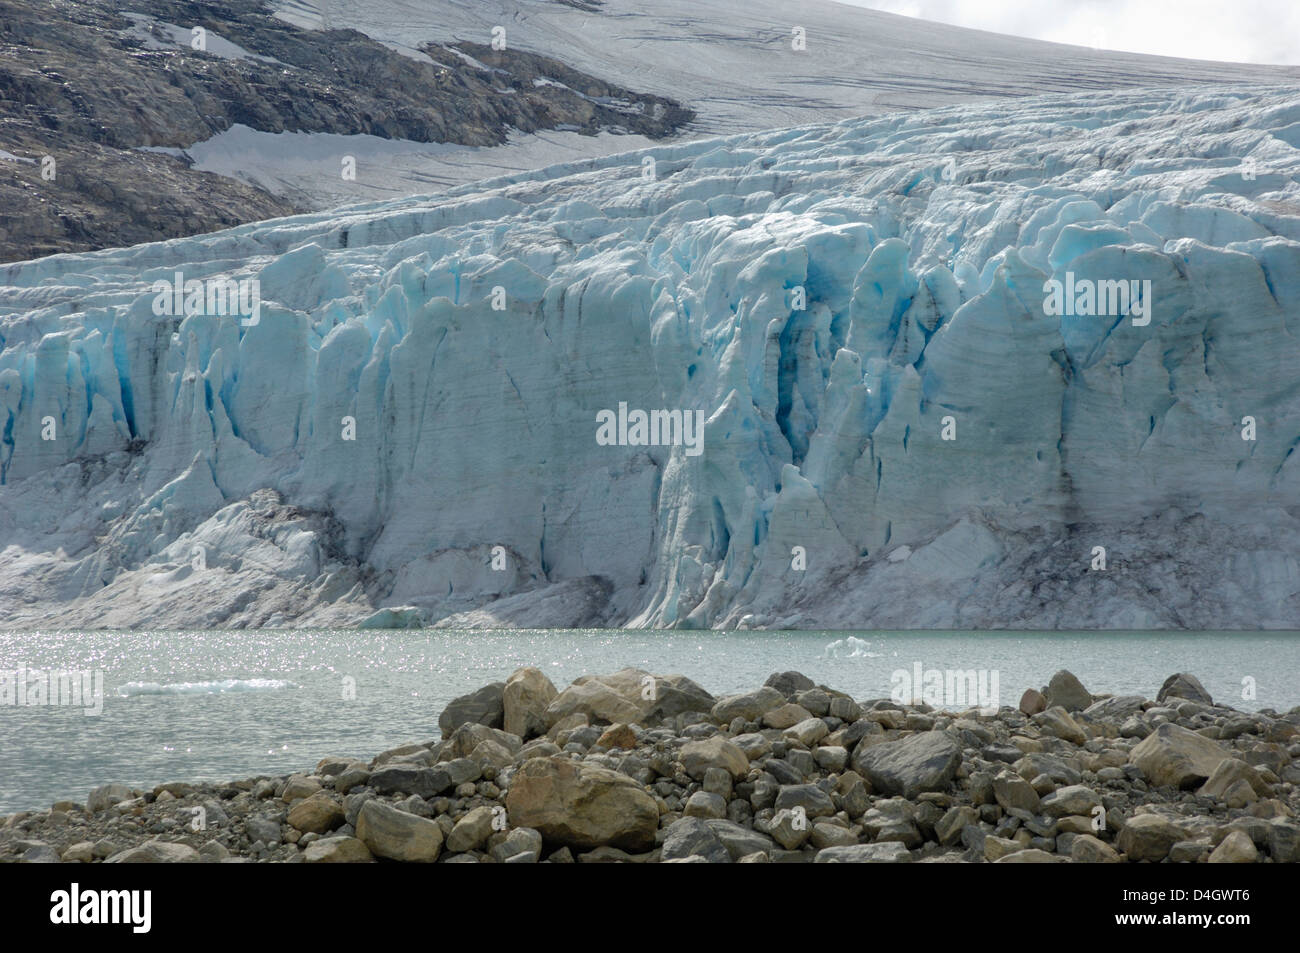 Austdalsbreen Glacier, Styggevatnet Lake, Jostedalsbreen Icecap, Sogn og Fjordane, Norway, Scandinavia - Stock Image